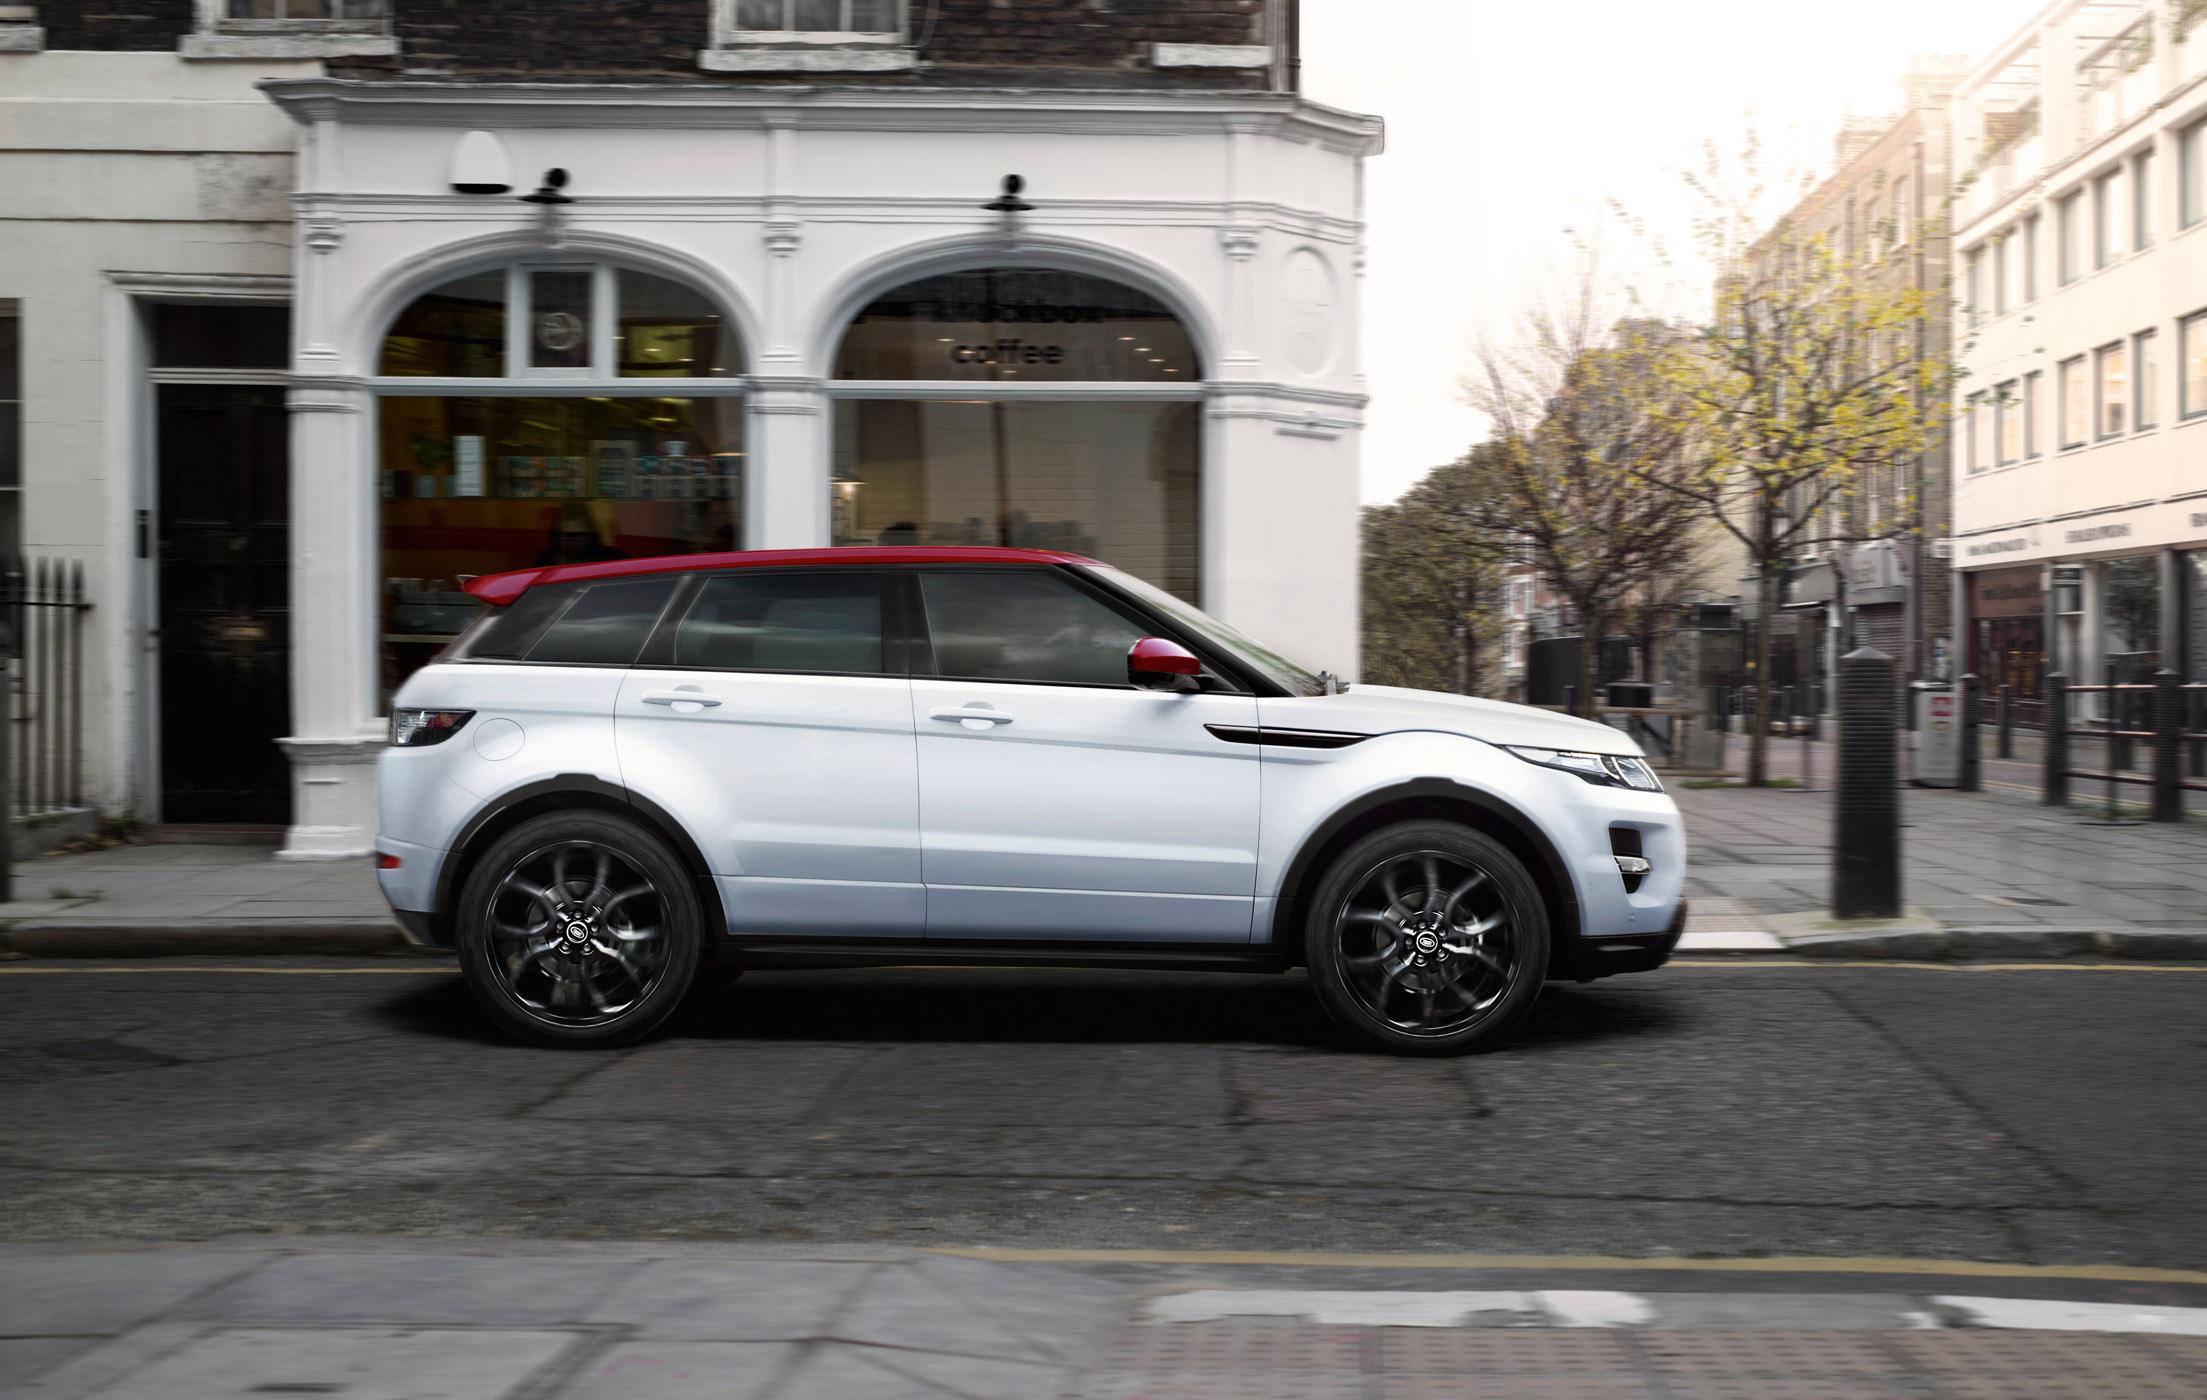 2015 Range Rover Evoque NW8 Special Edition